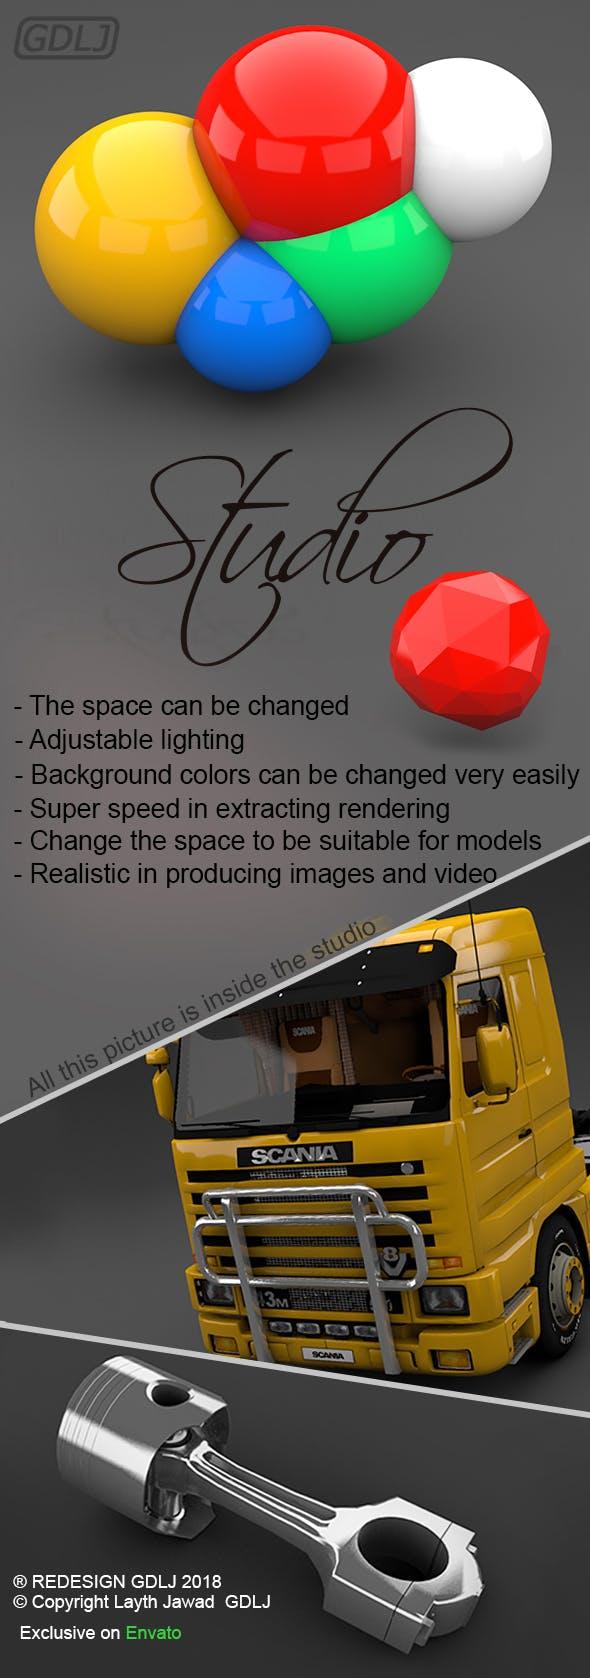 Studio - 3DOcean Item for Sale